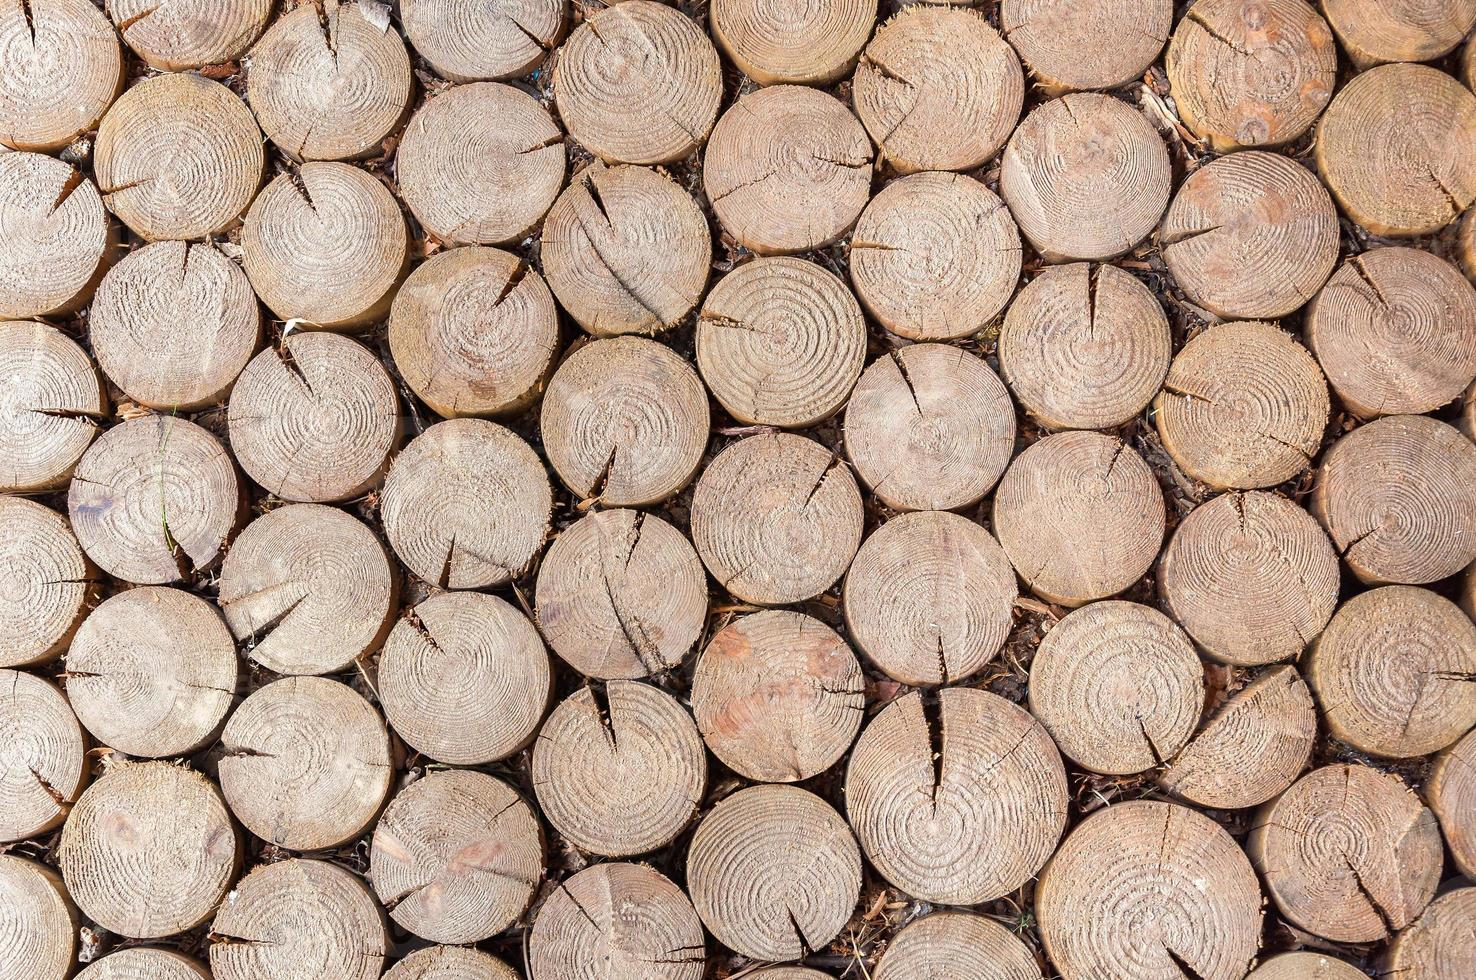 Fondo de troncos de leña foto